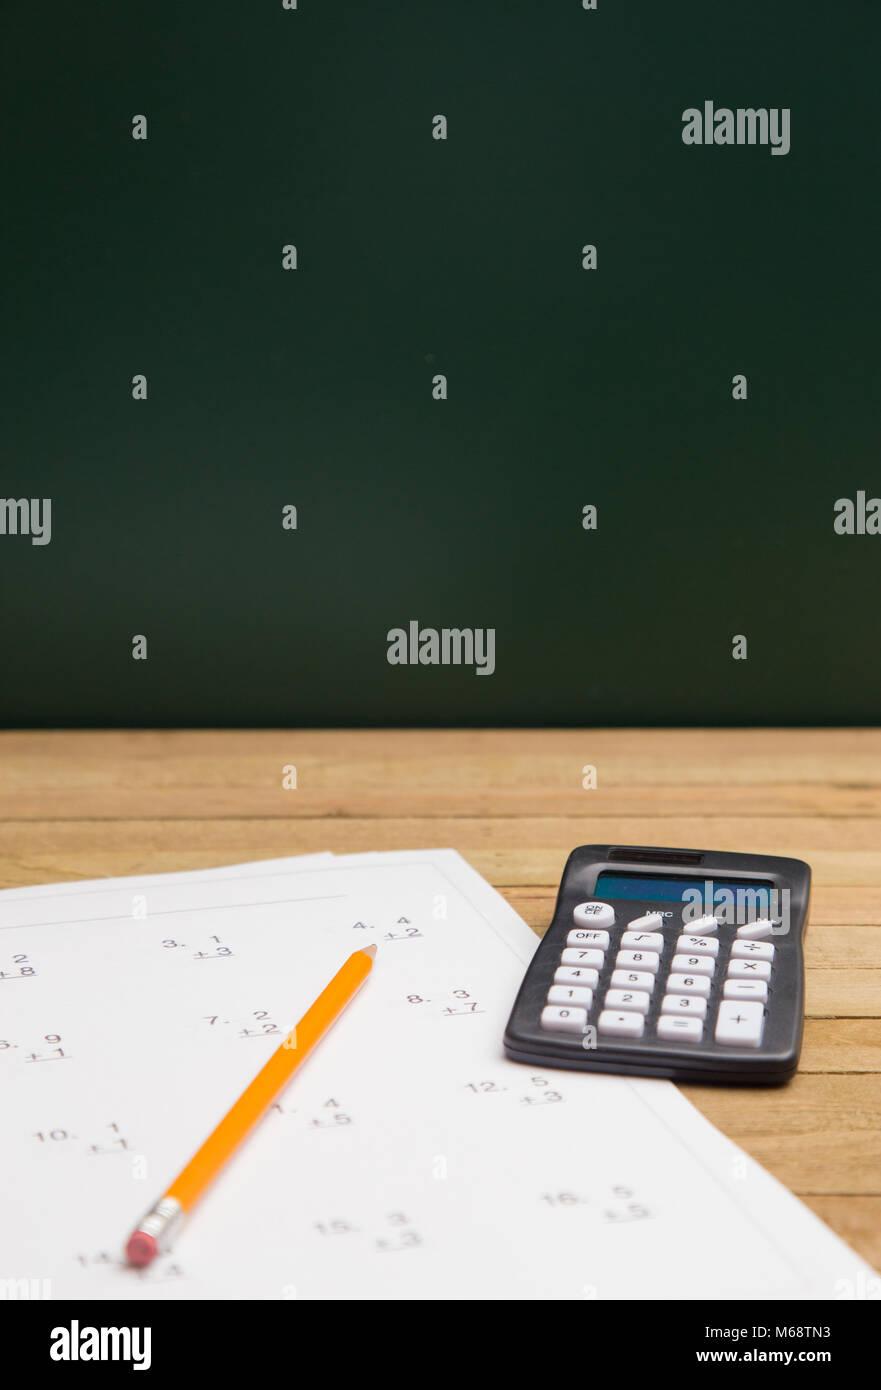 Nett Einfache Mathematische Arbeitsblatt Ideen - Super Lehrer ...